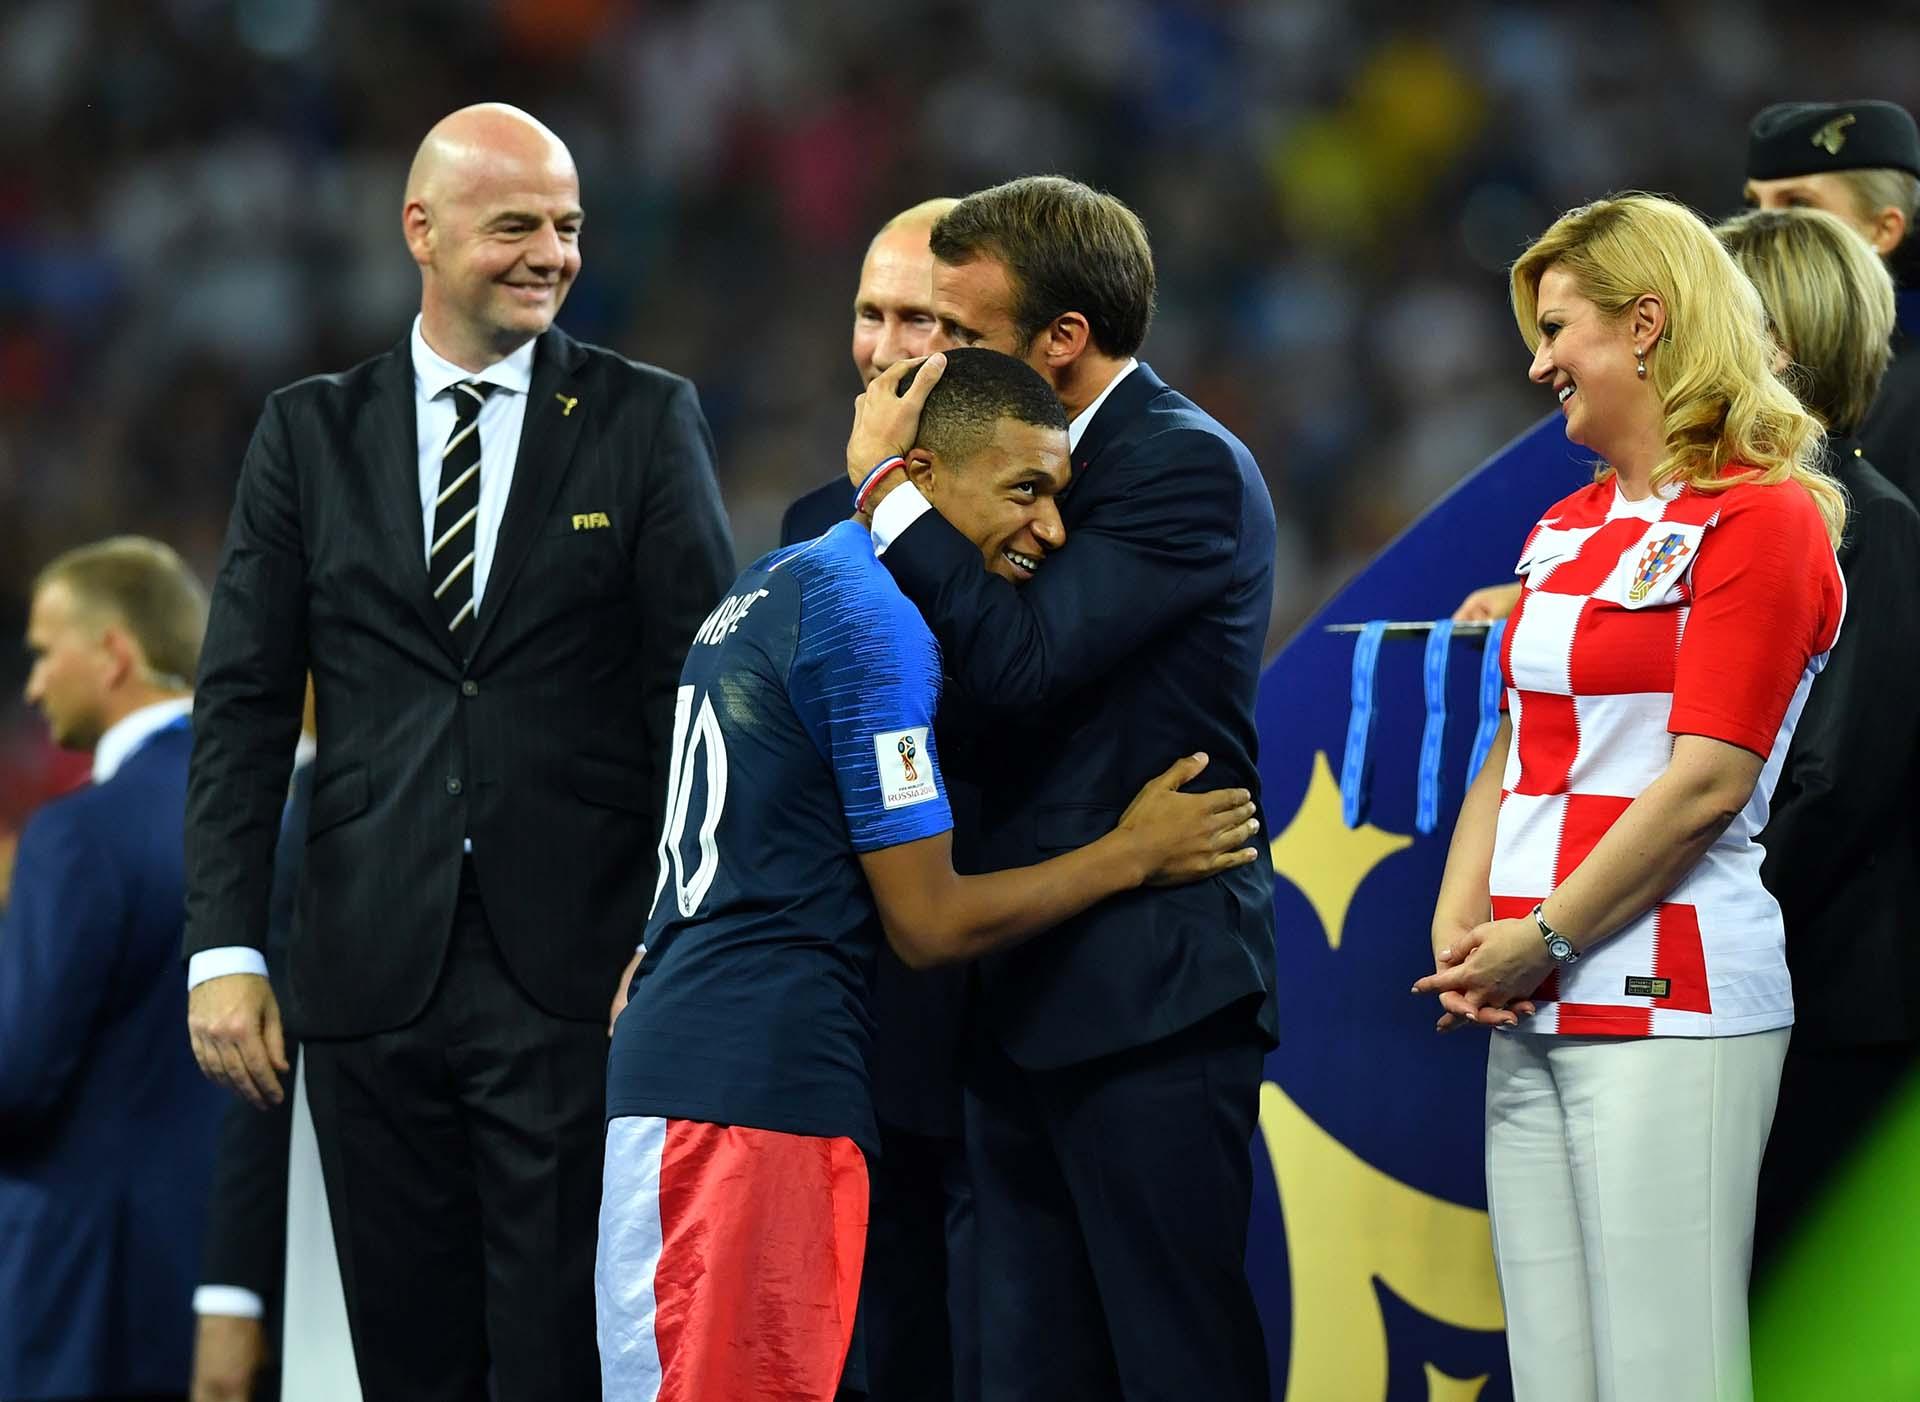 El abrazo de Mbappé con Macron